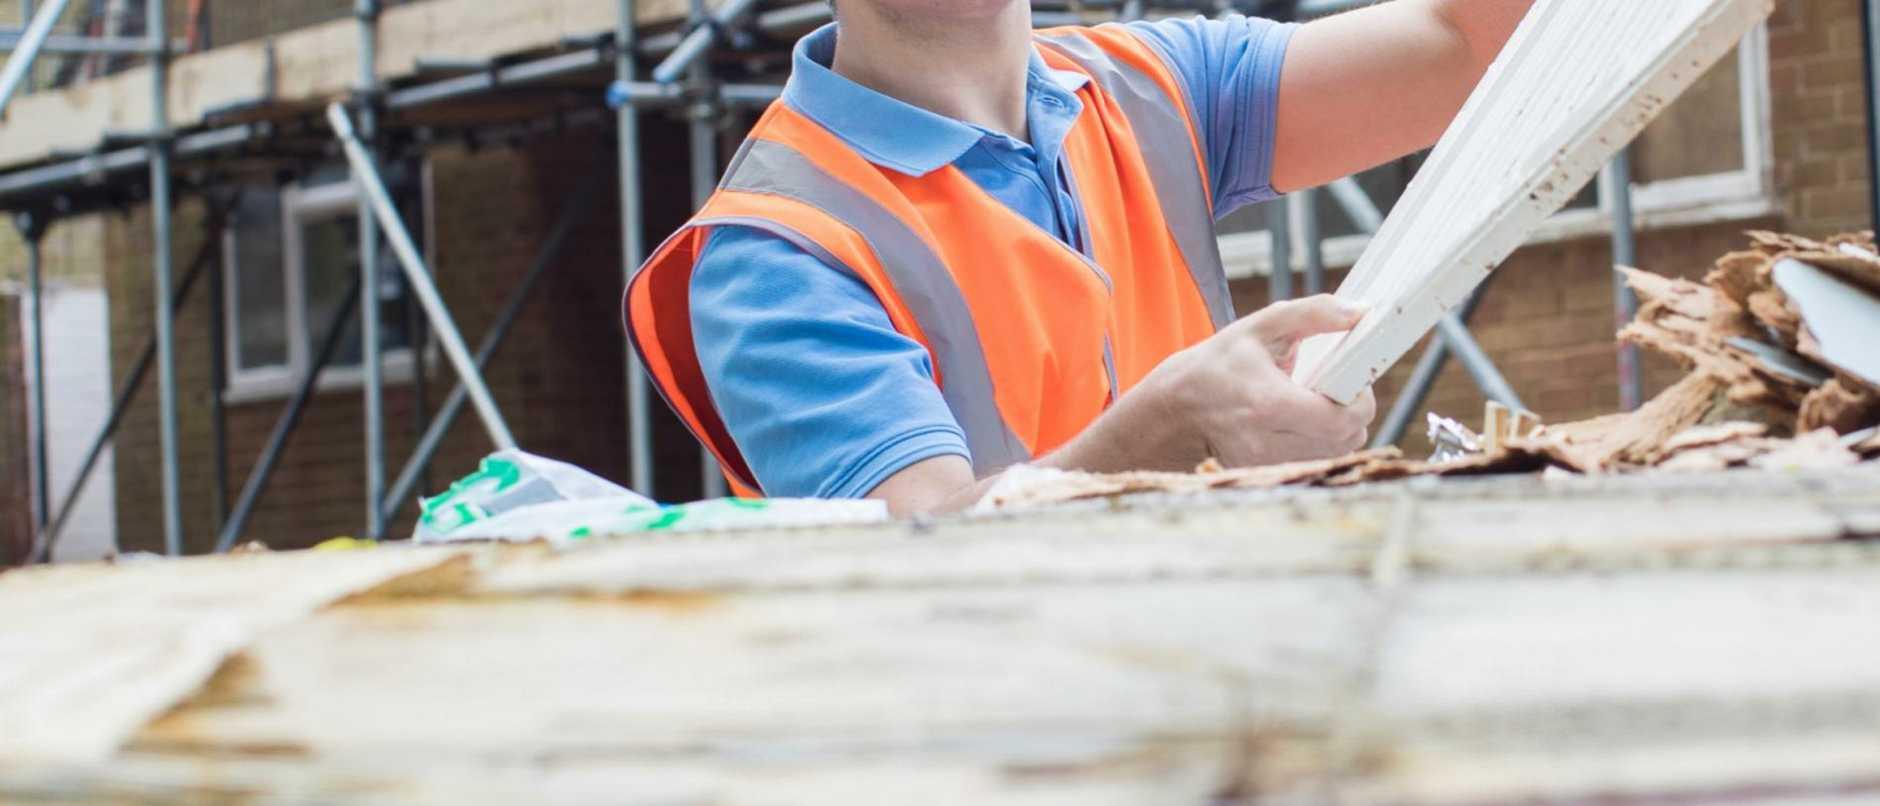 Builder On Site Putting Waste Into Rubbish Skip